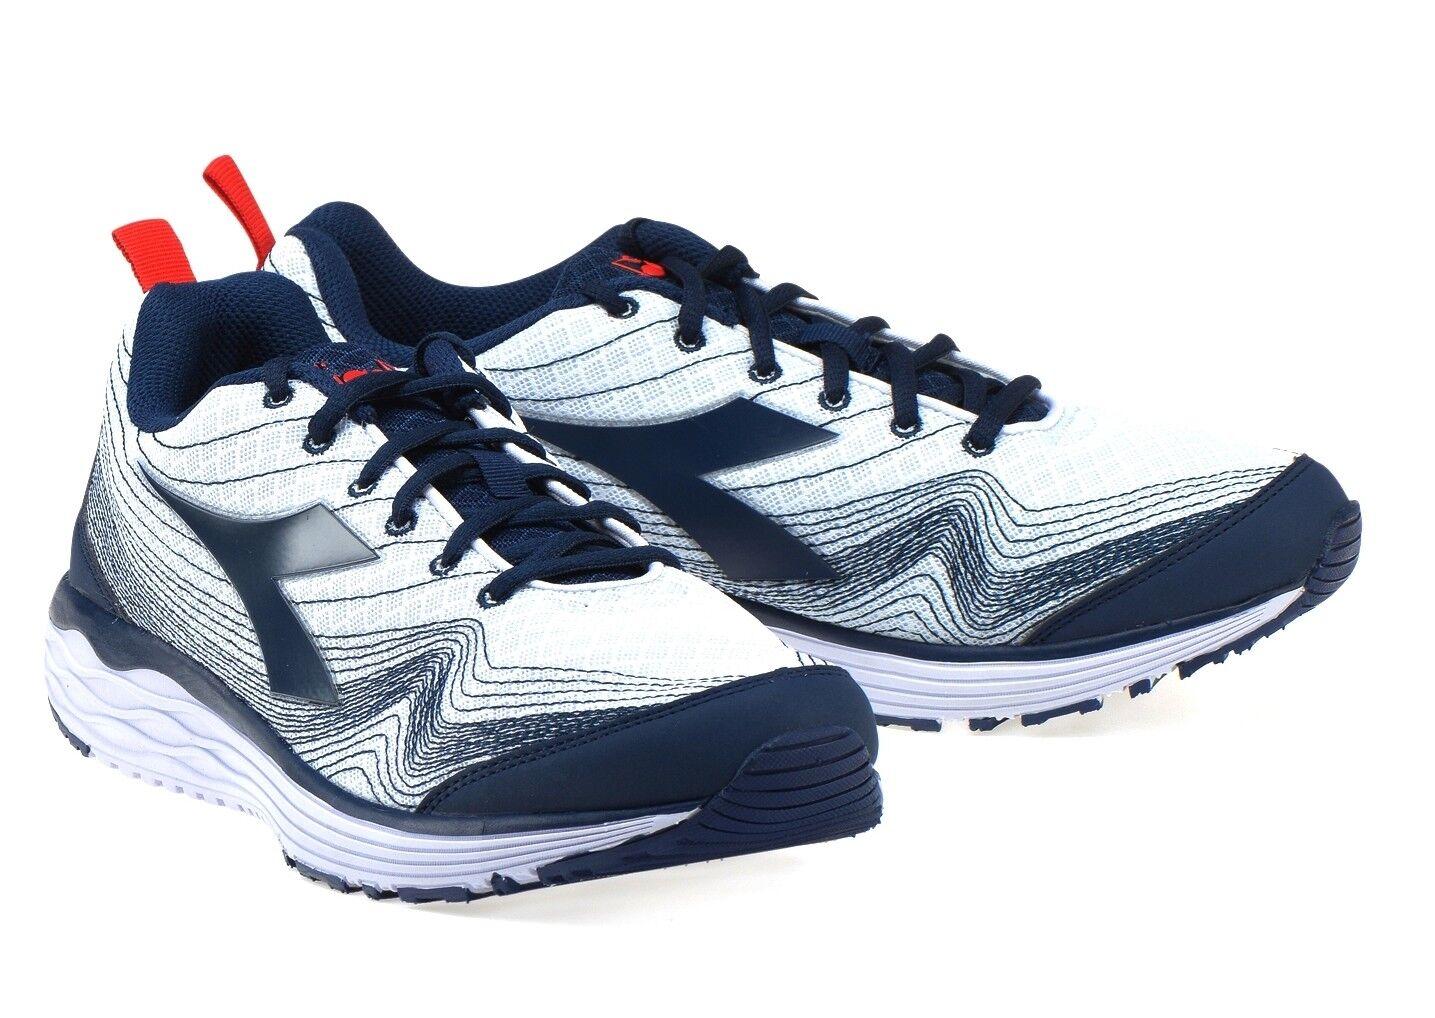 DIADORA FLAMANT chaussures de sport de course homme casual baskets tissu